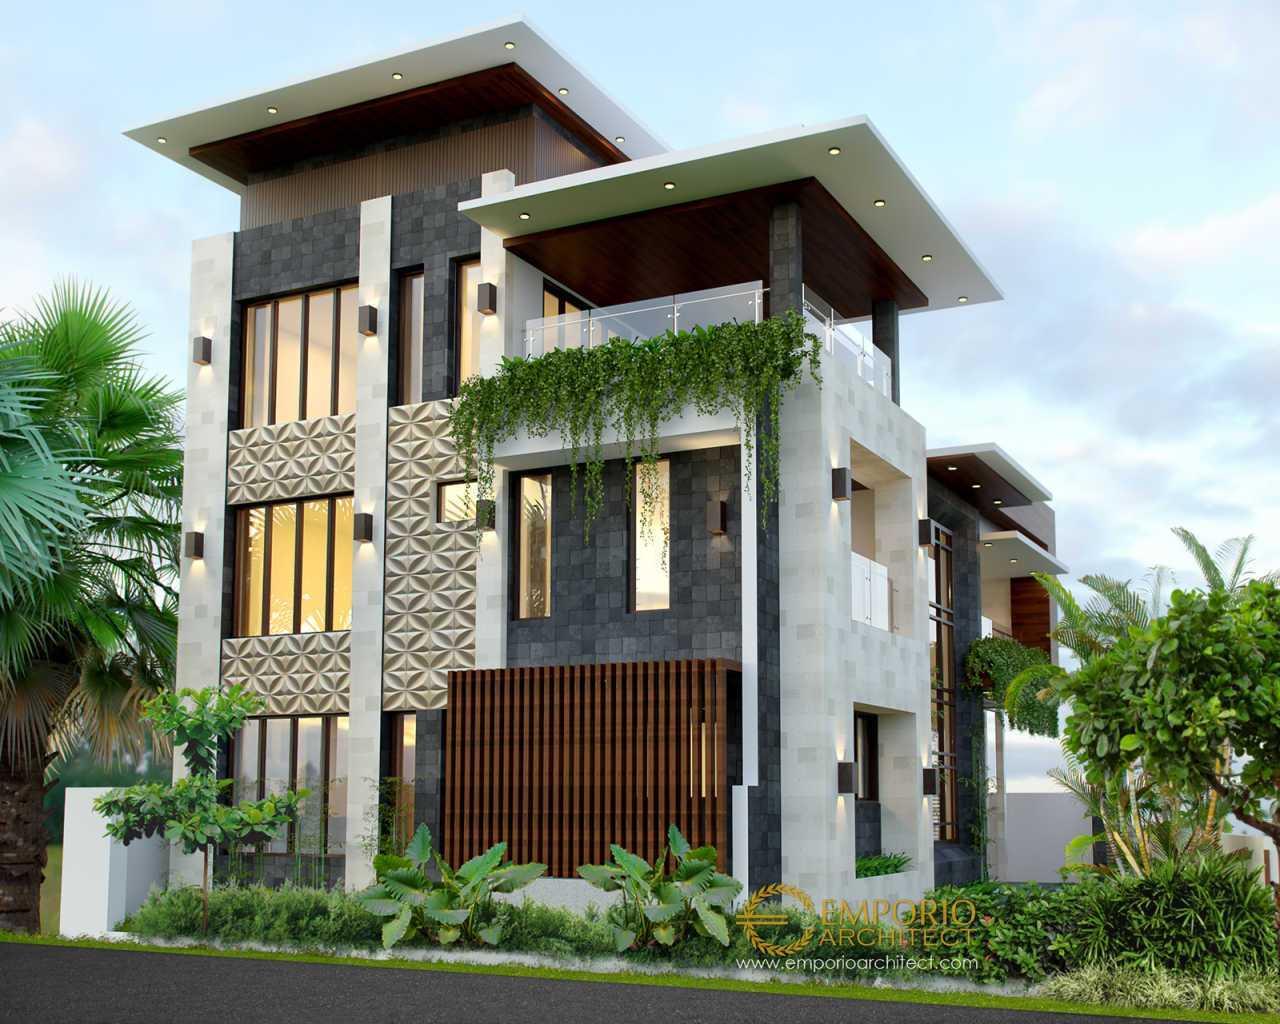 Emporio Architect Jasa Arsitek India Desain Rumah Modern 3 Lantai 422 @ Bangalore, India Bengaluru, Karnataka, India Bengaluru, Karnataka, India Emporio-Architect-Jasa-Arsitek-India-Desain-Rumah-Modern-3-Lantai-422-Bangalore-India  91635